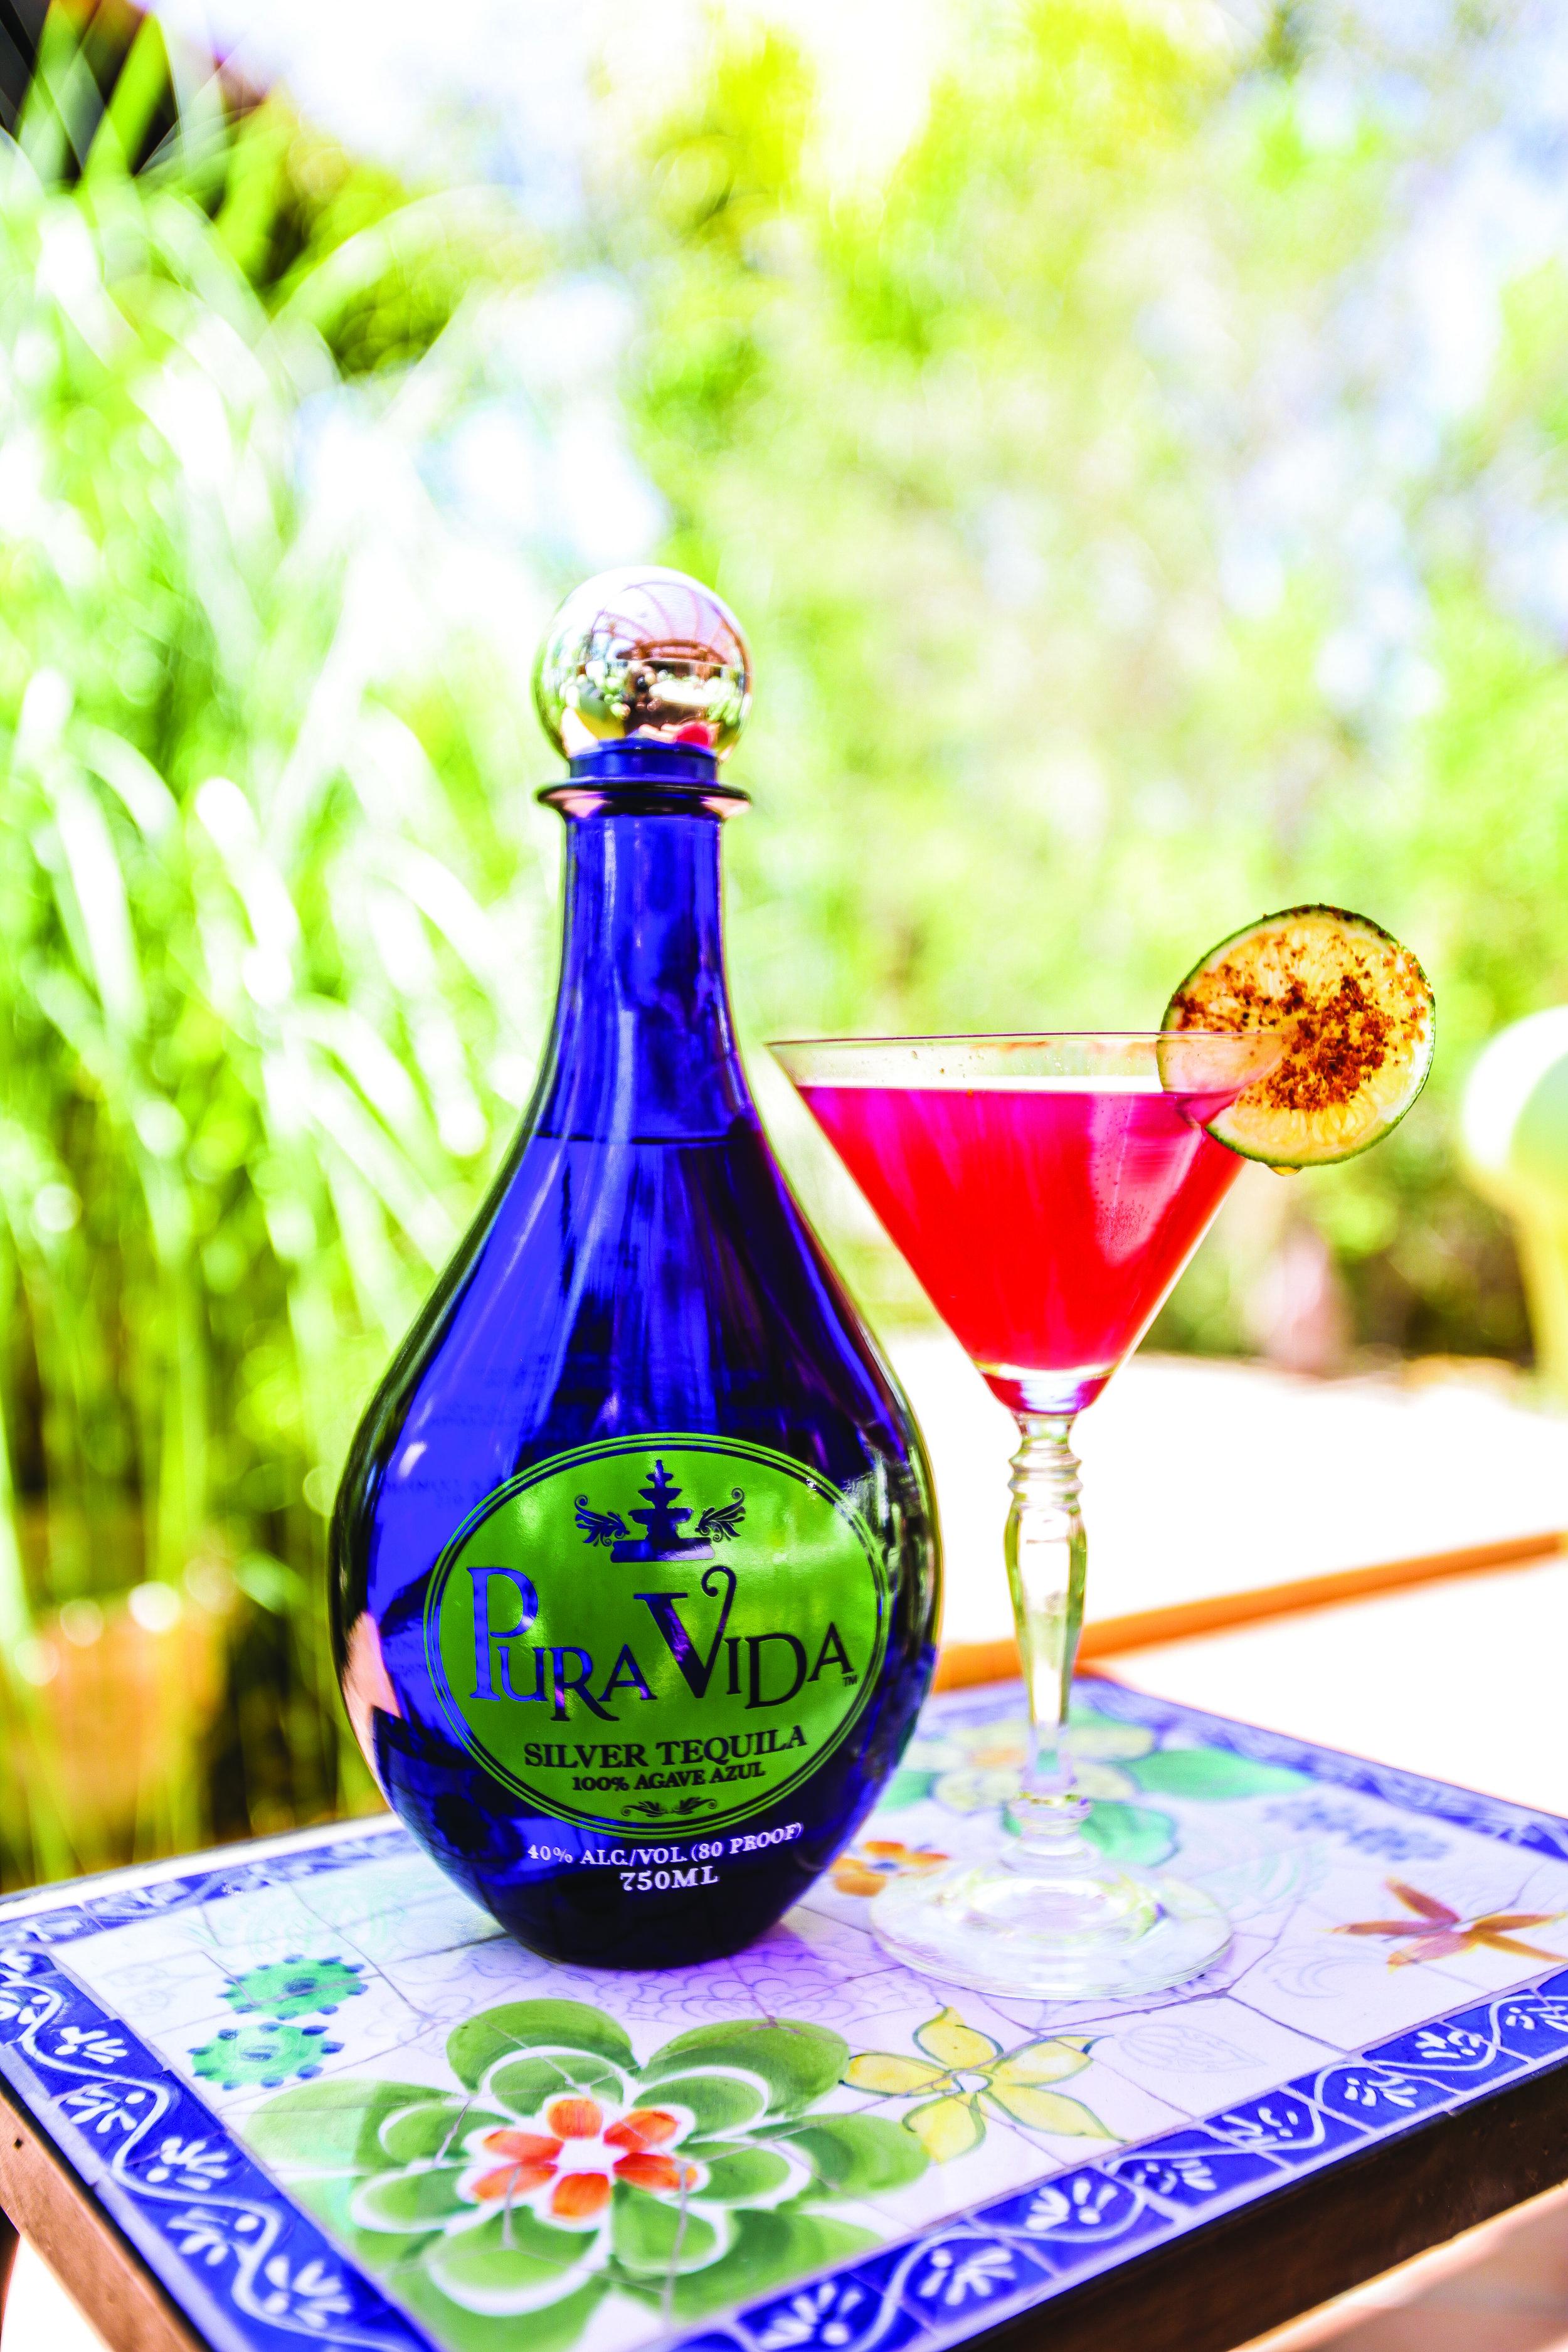 pura vida tequila - kaitlyn skloss, co-founder